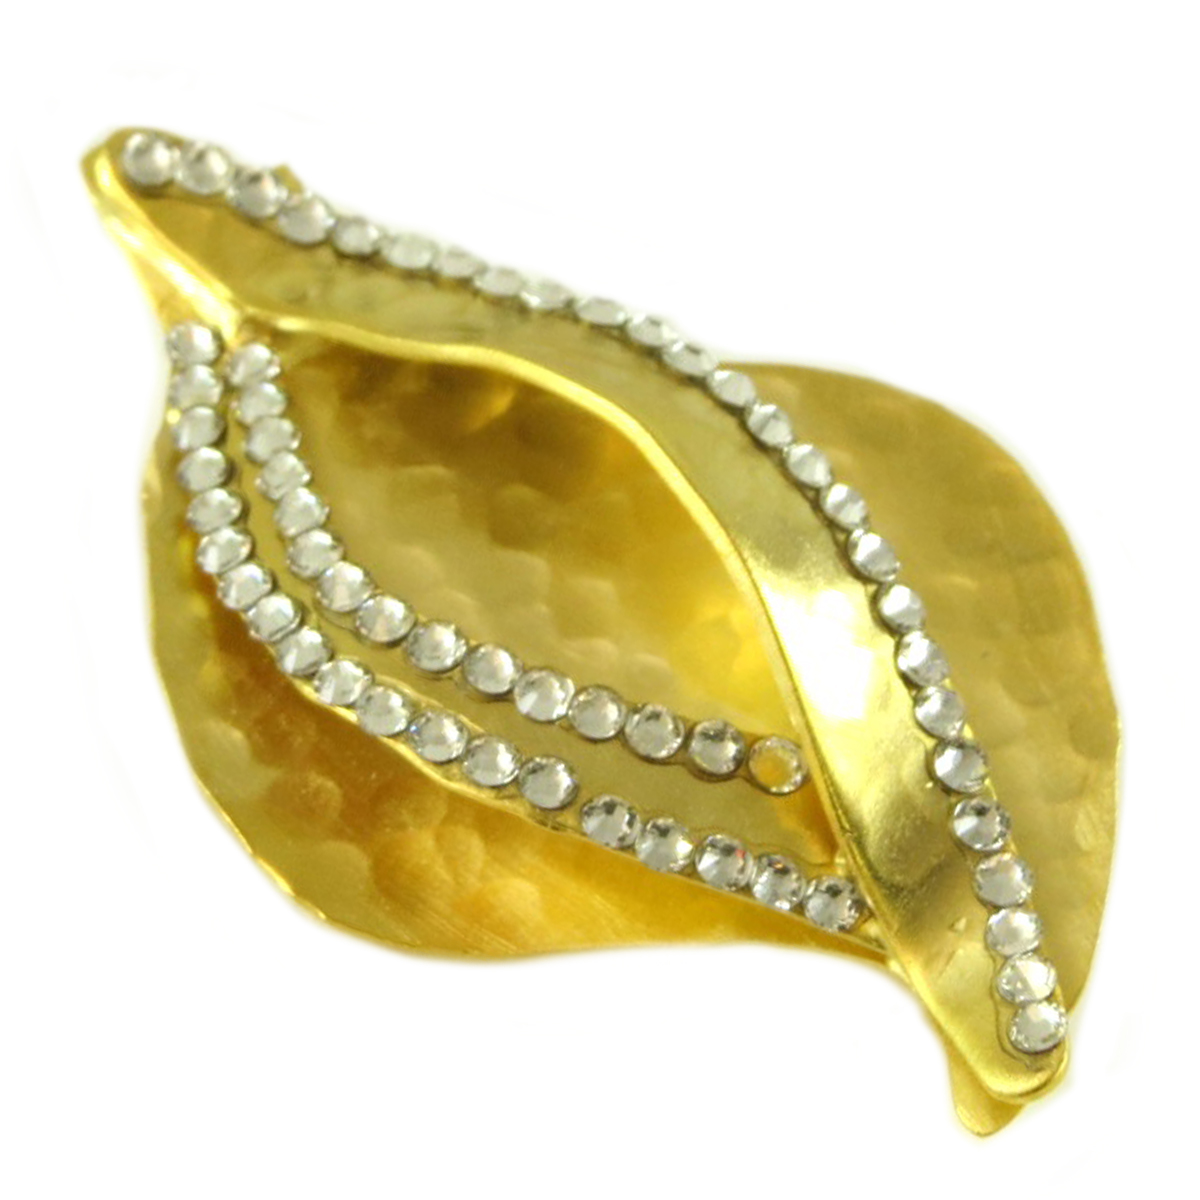 Broche artisanale \'Athena\' blanc doré  - 45x25 mm - [Q7844]